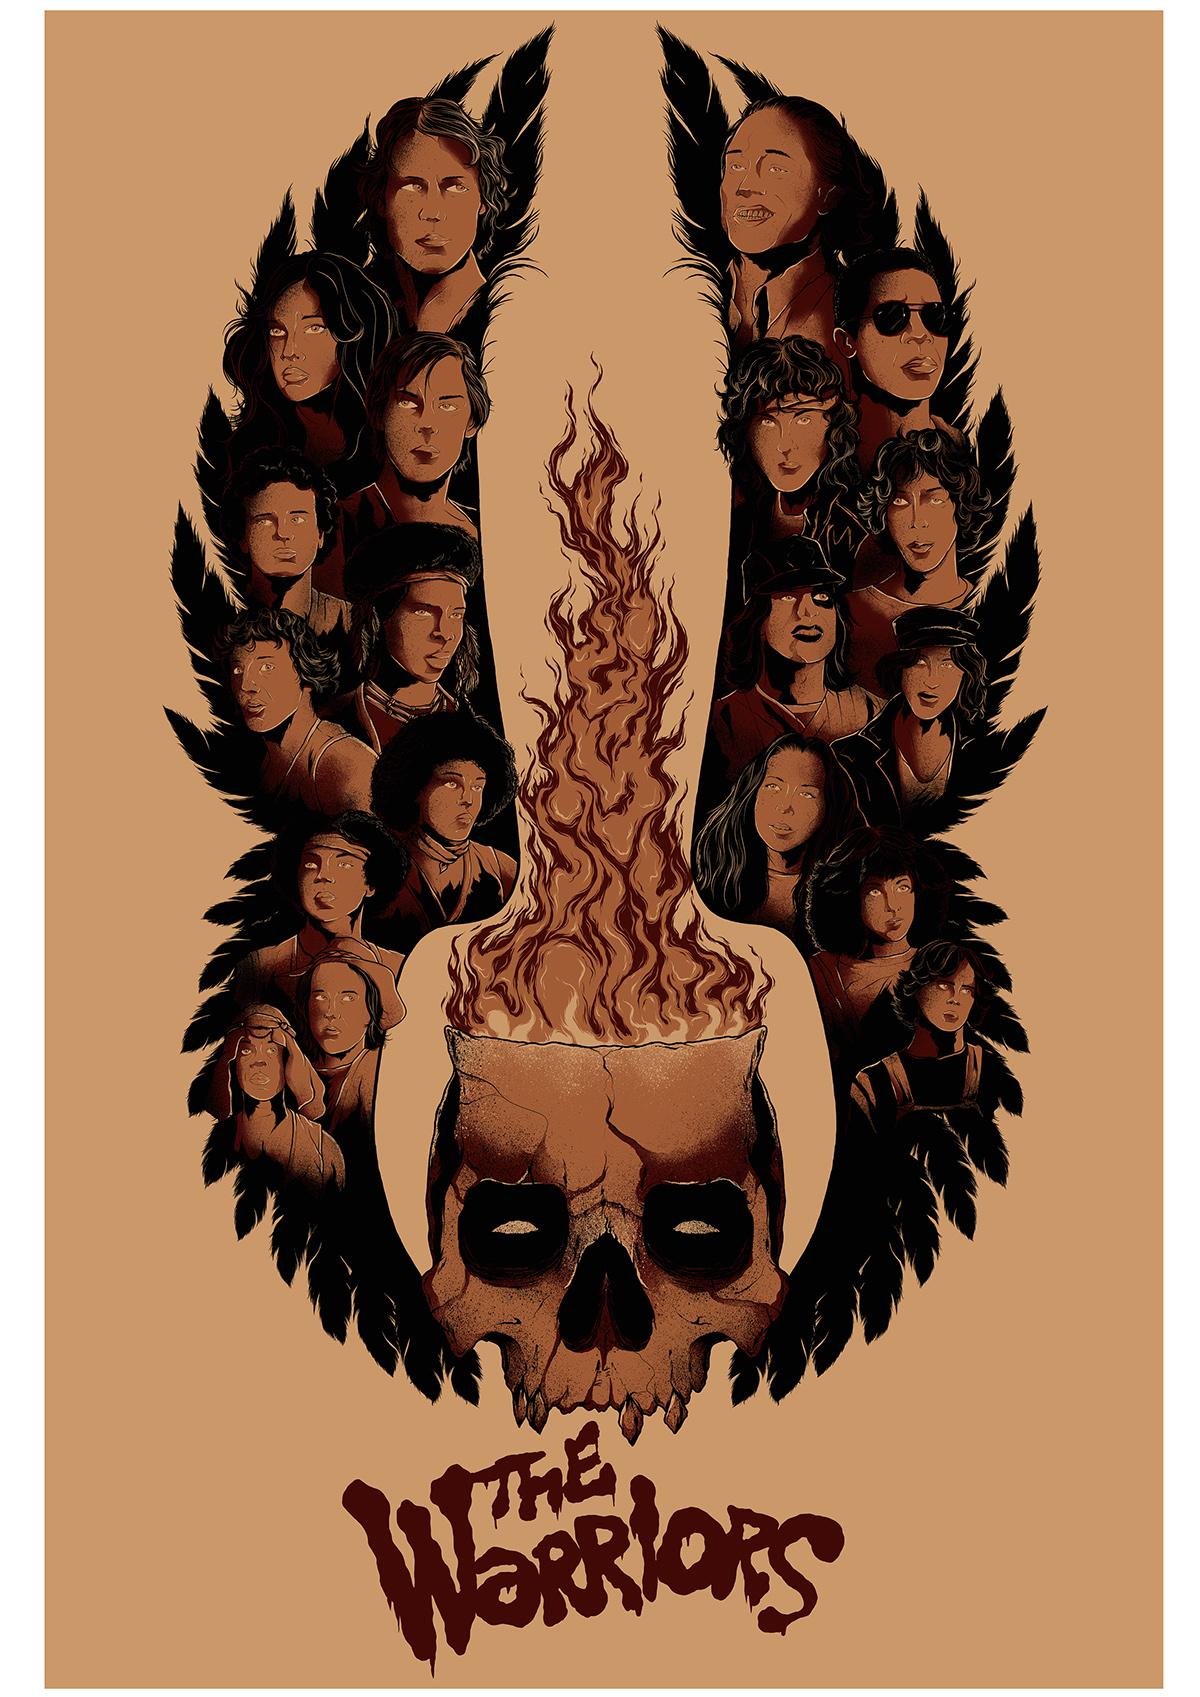 The Warriors (1979) Alternative Movie Poster on Wacom Gallery